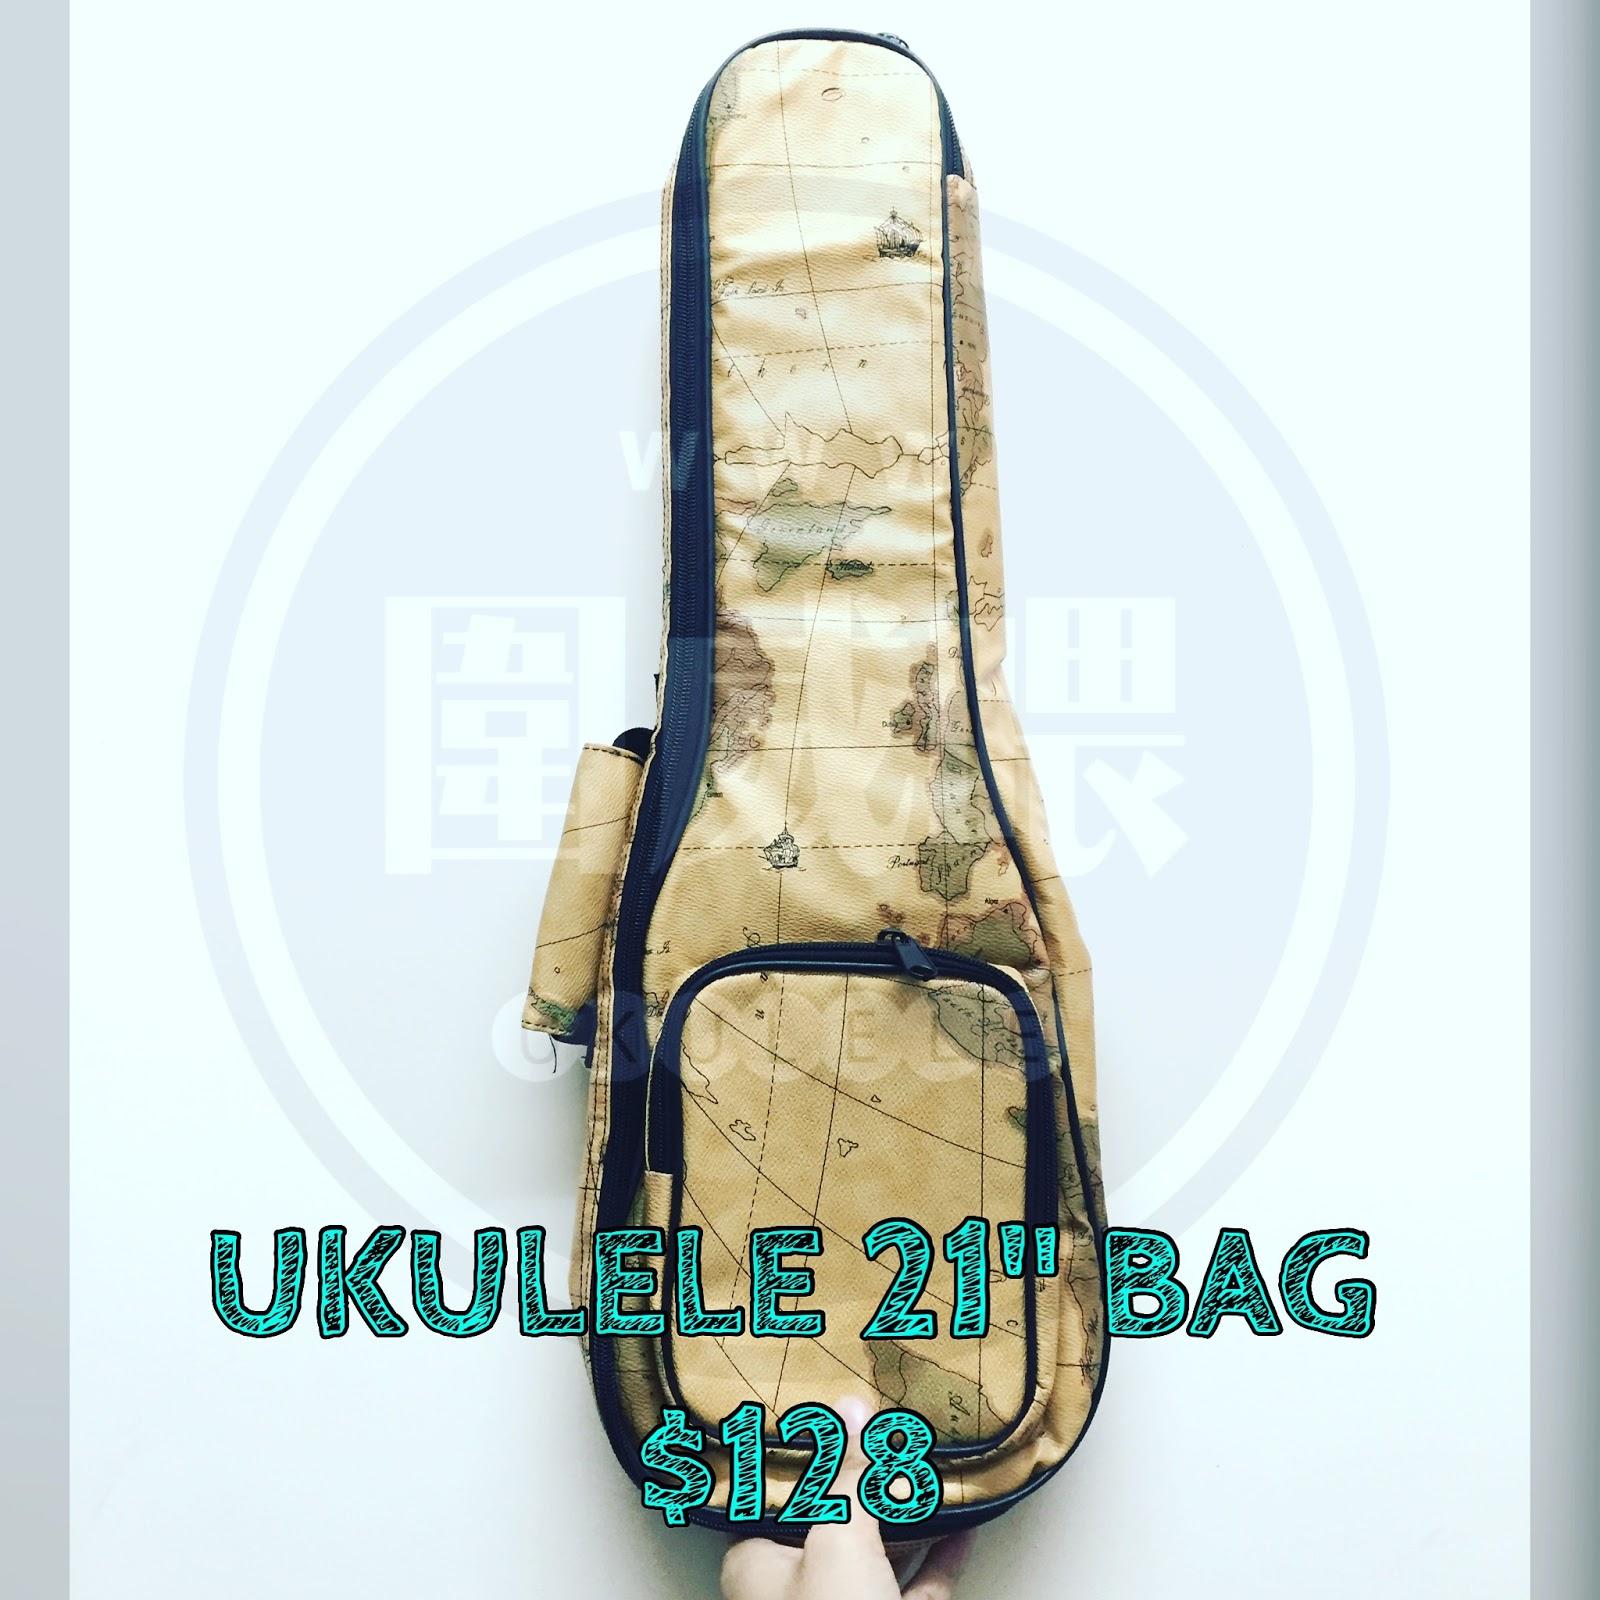 圍威喂 ukulele: Ukulele 厚袋